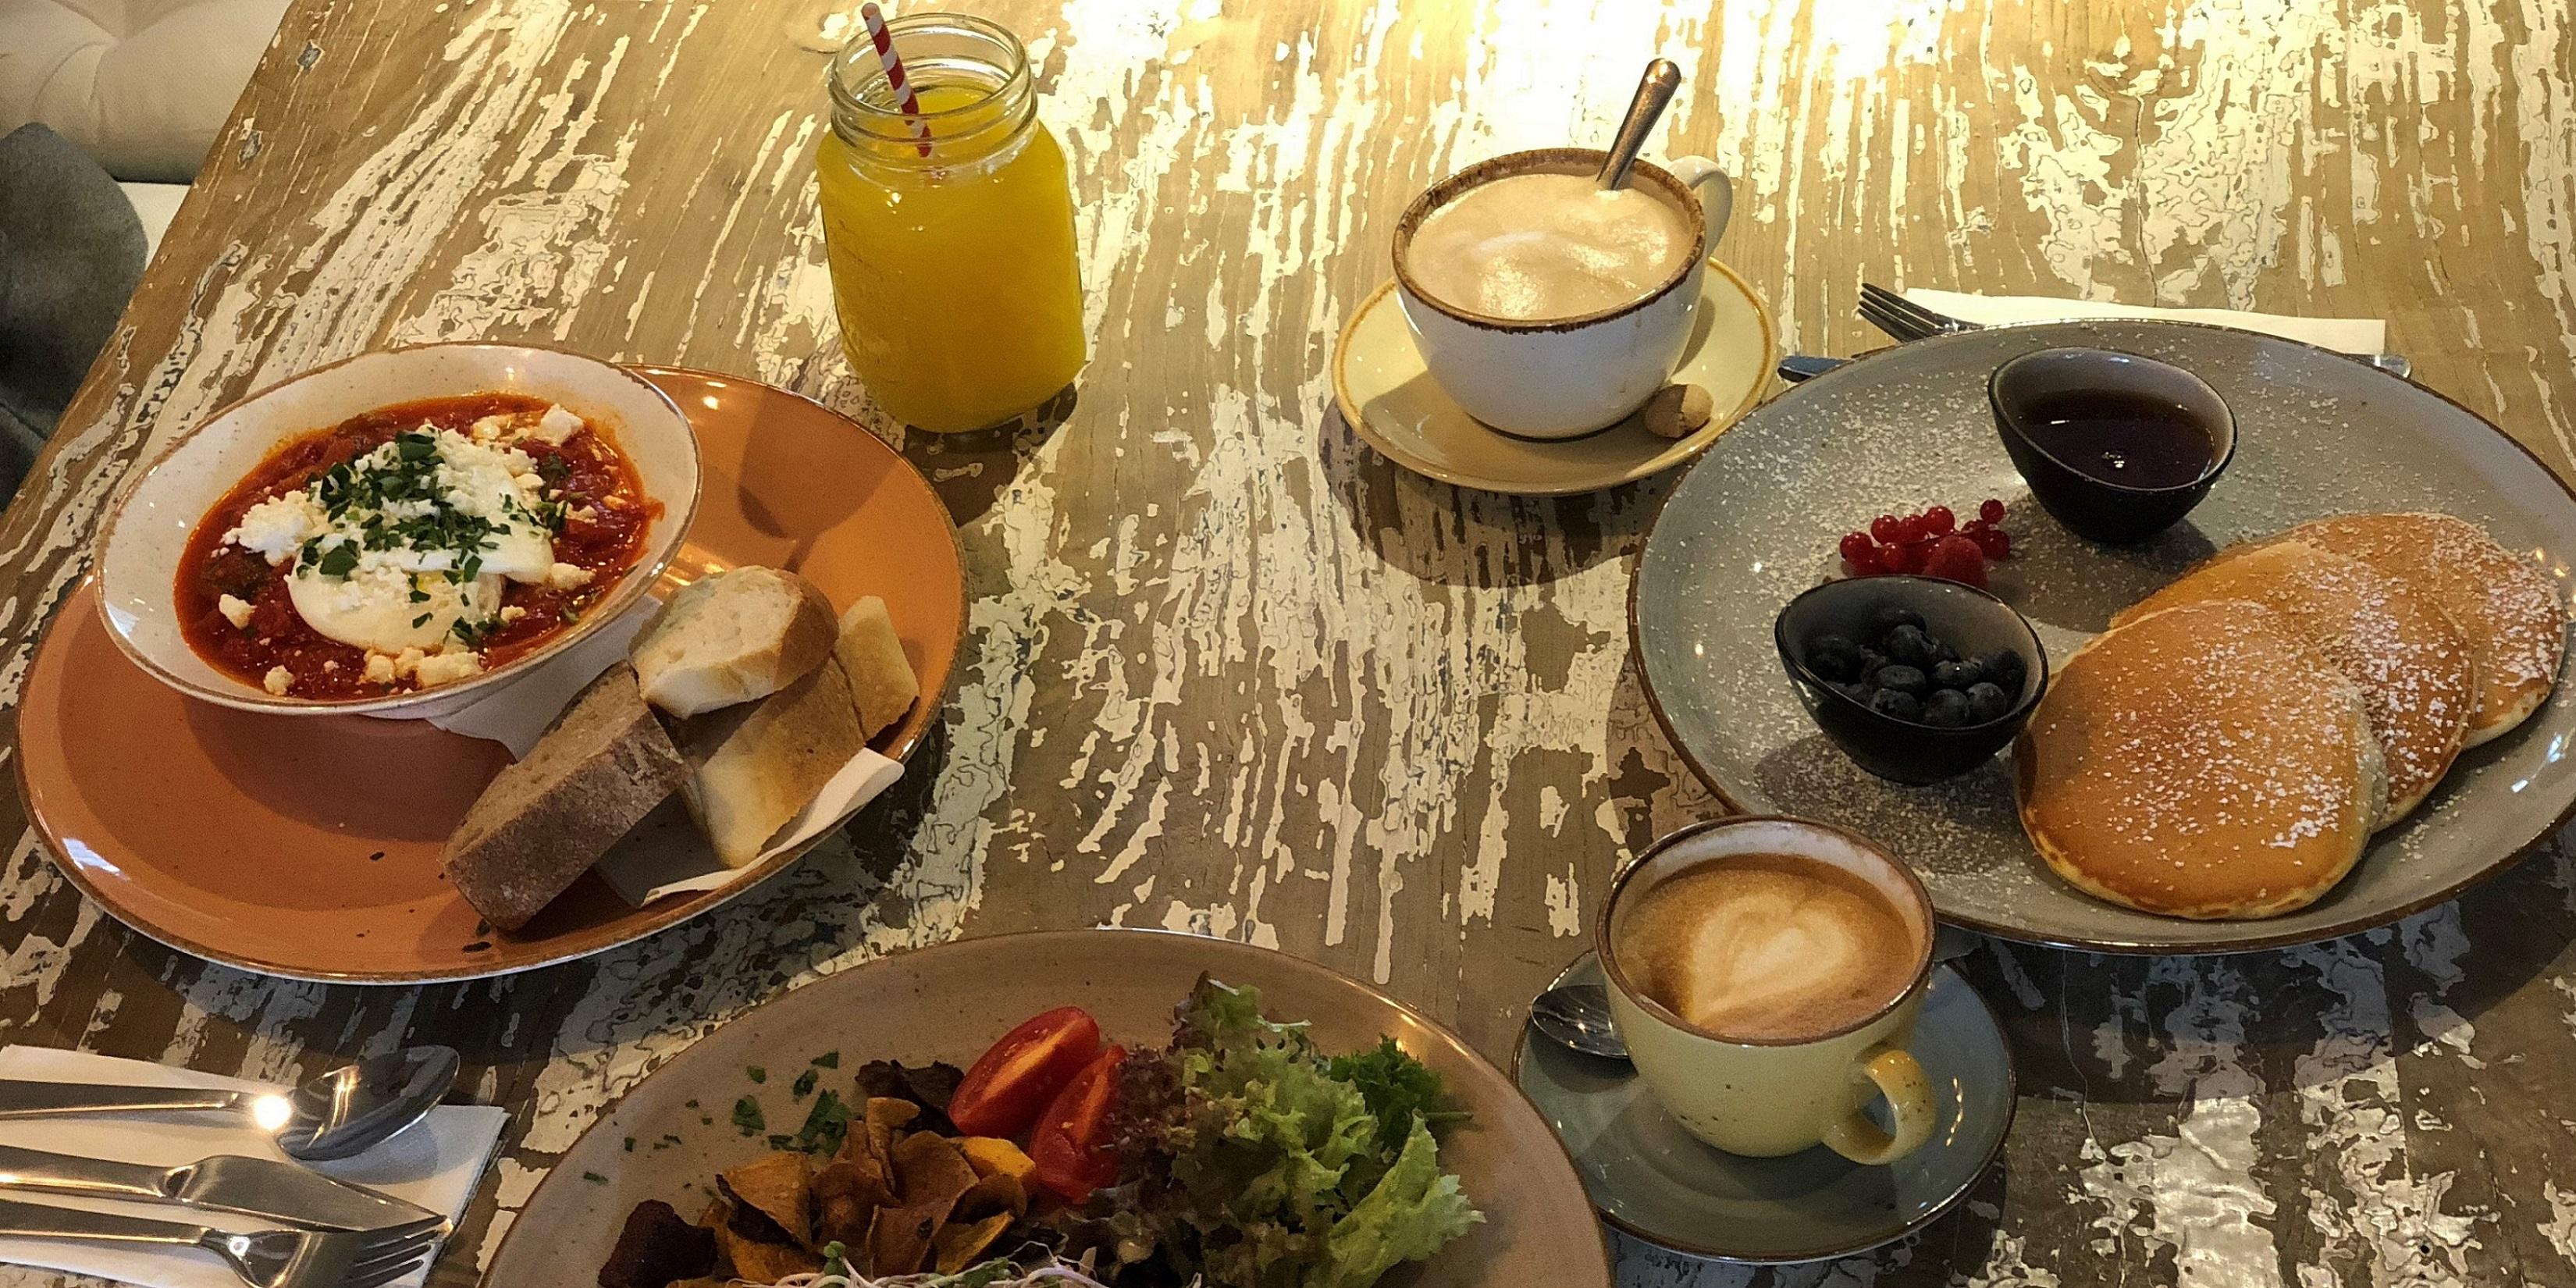 Brunch Stilbruch Kaffee (10245 Berlin)